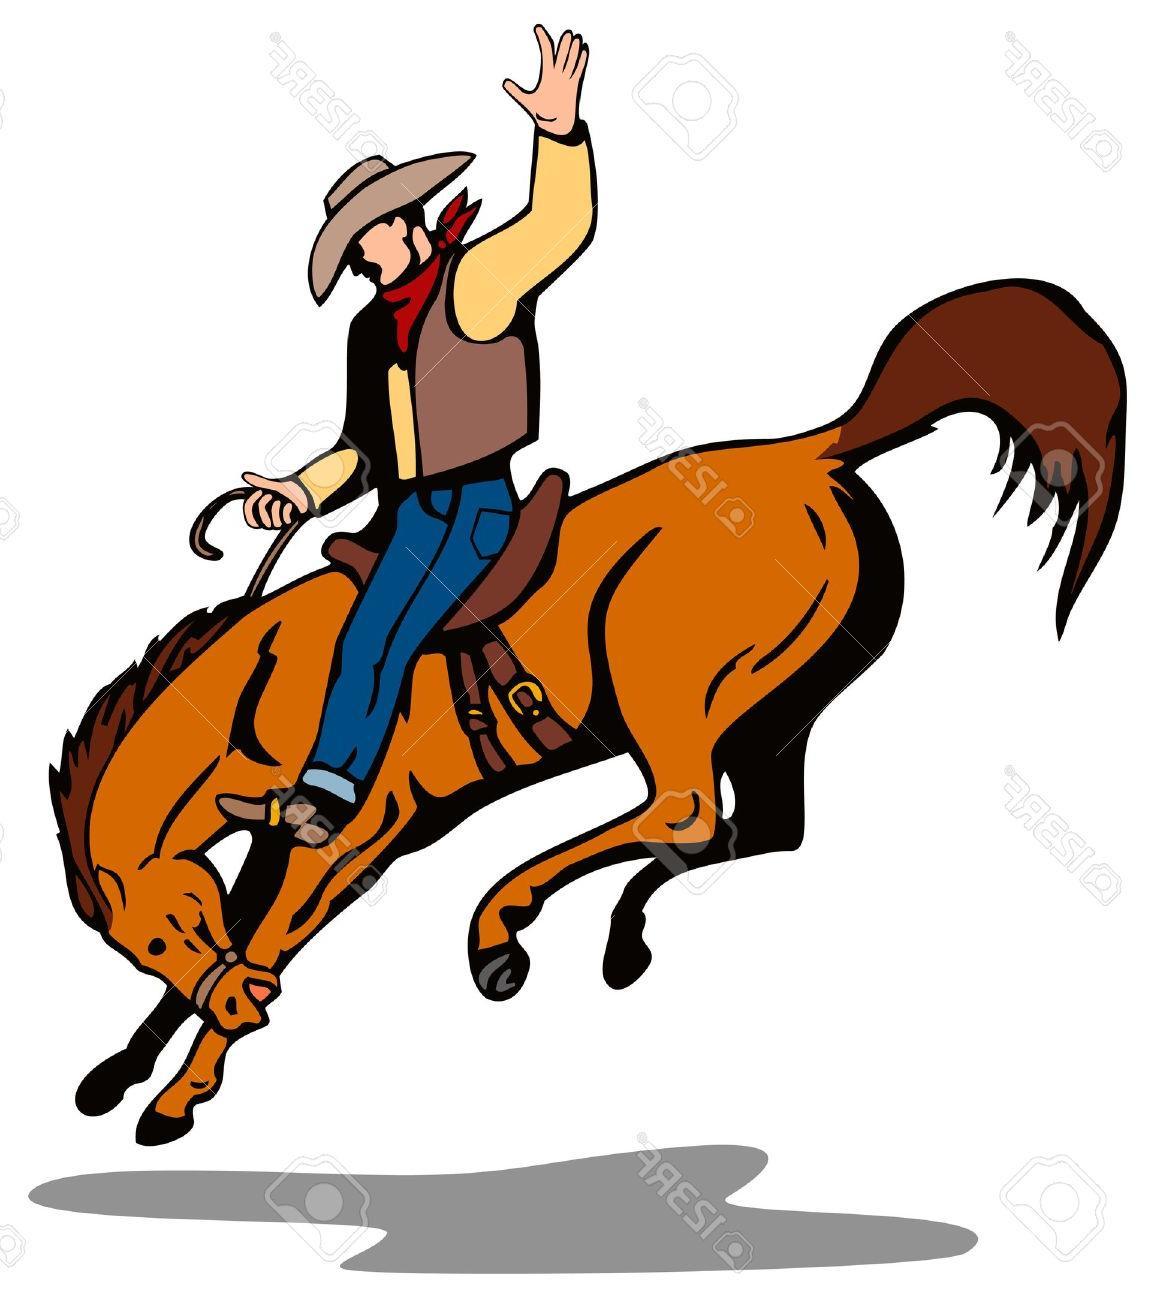 Top Bucking Horse Clip Art Design » Free Vector Art, Images.